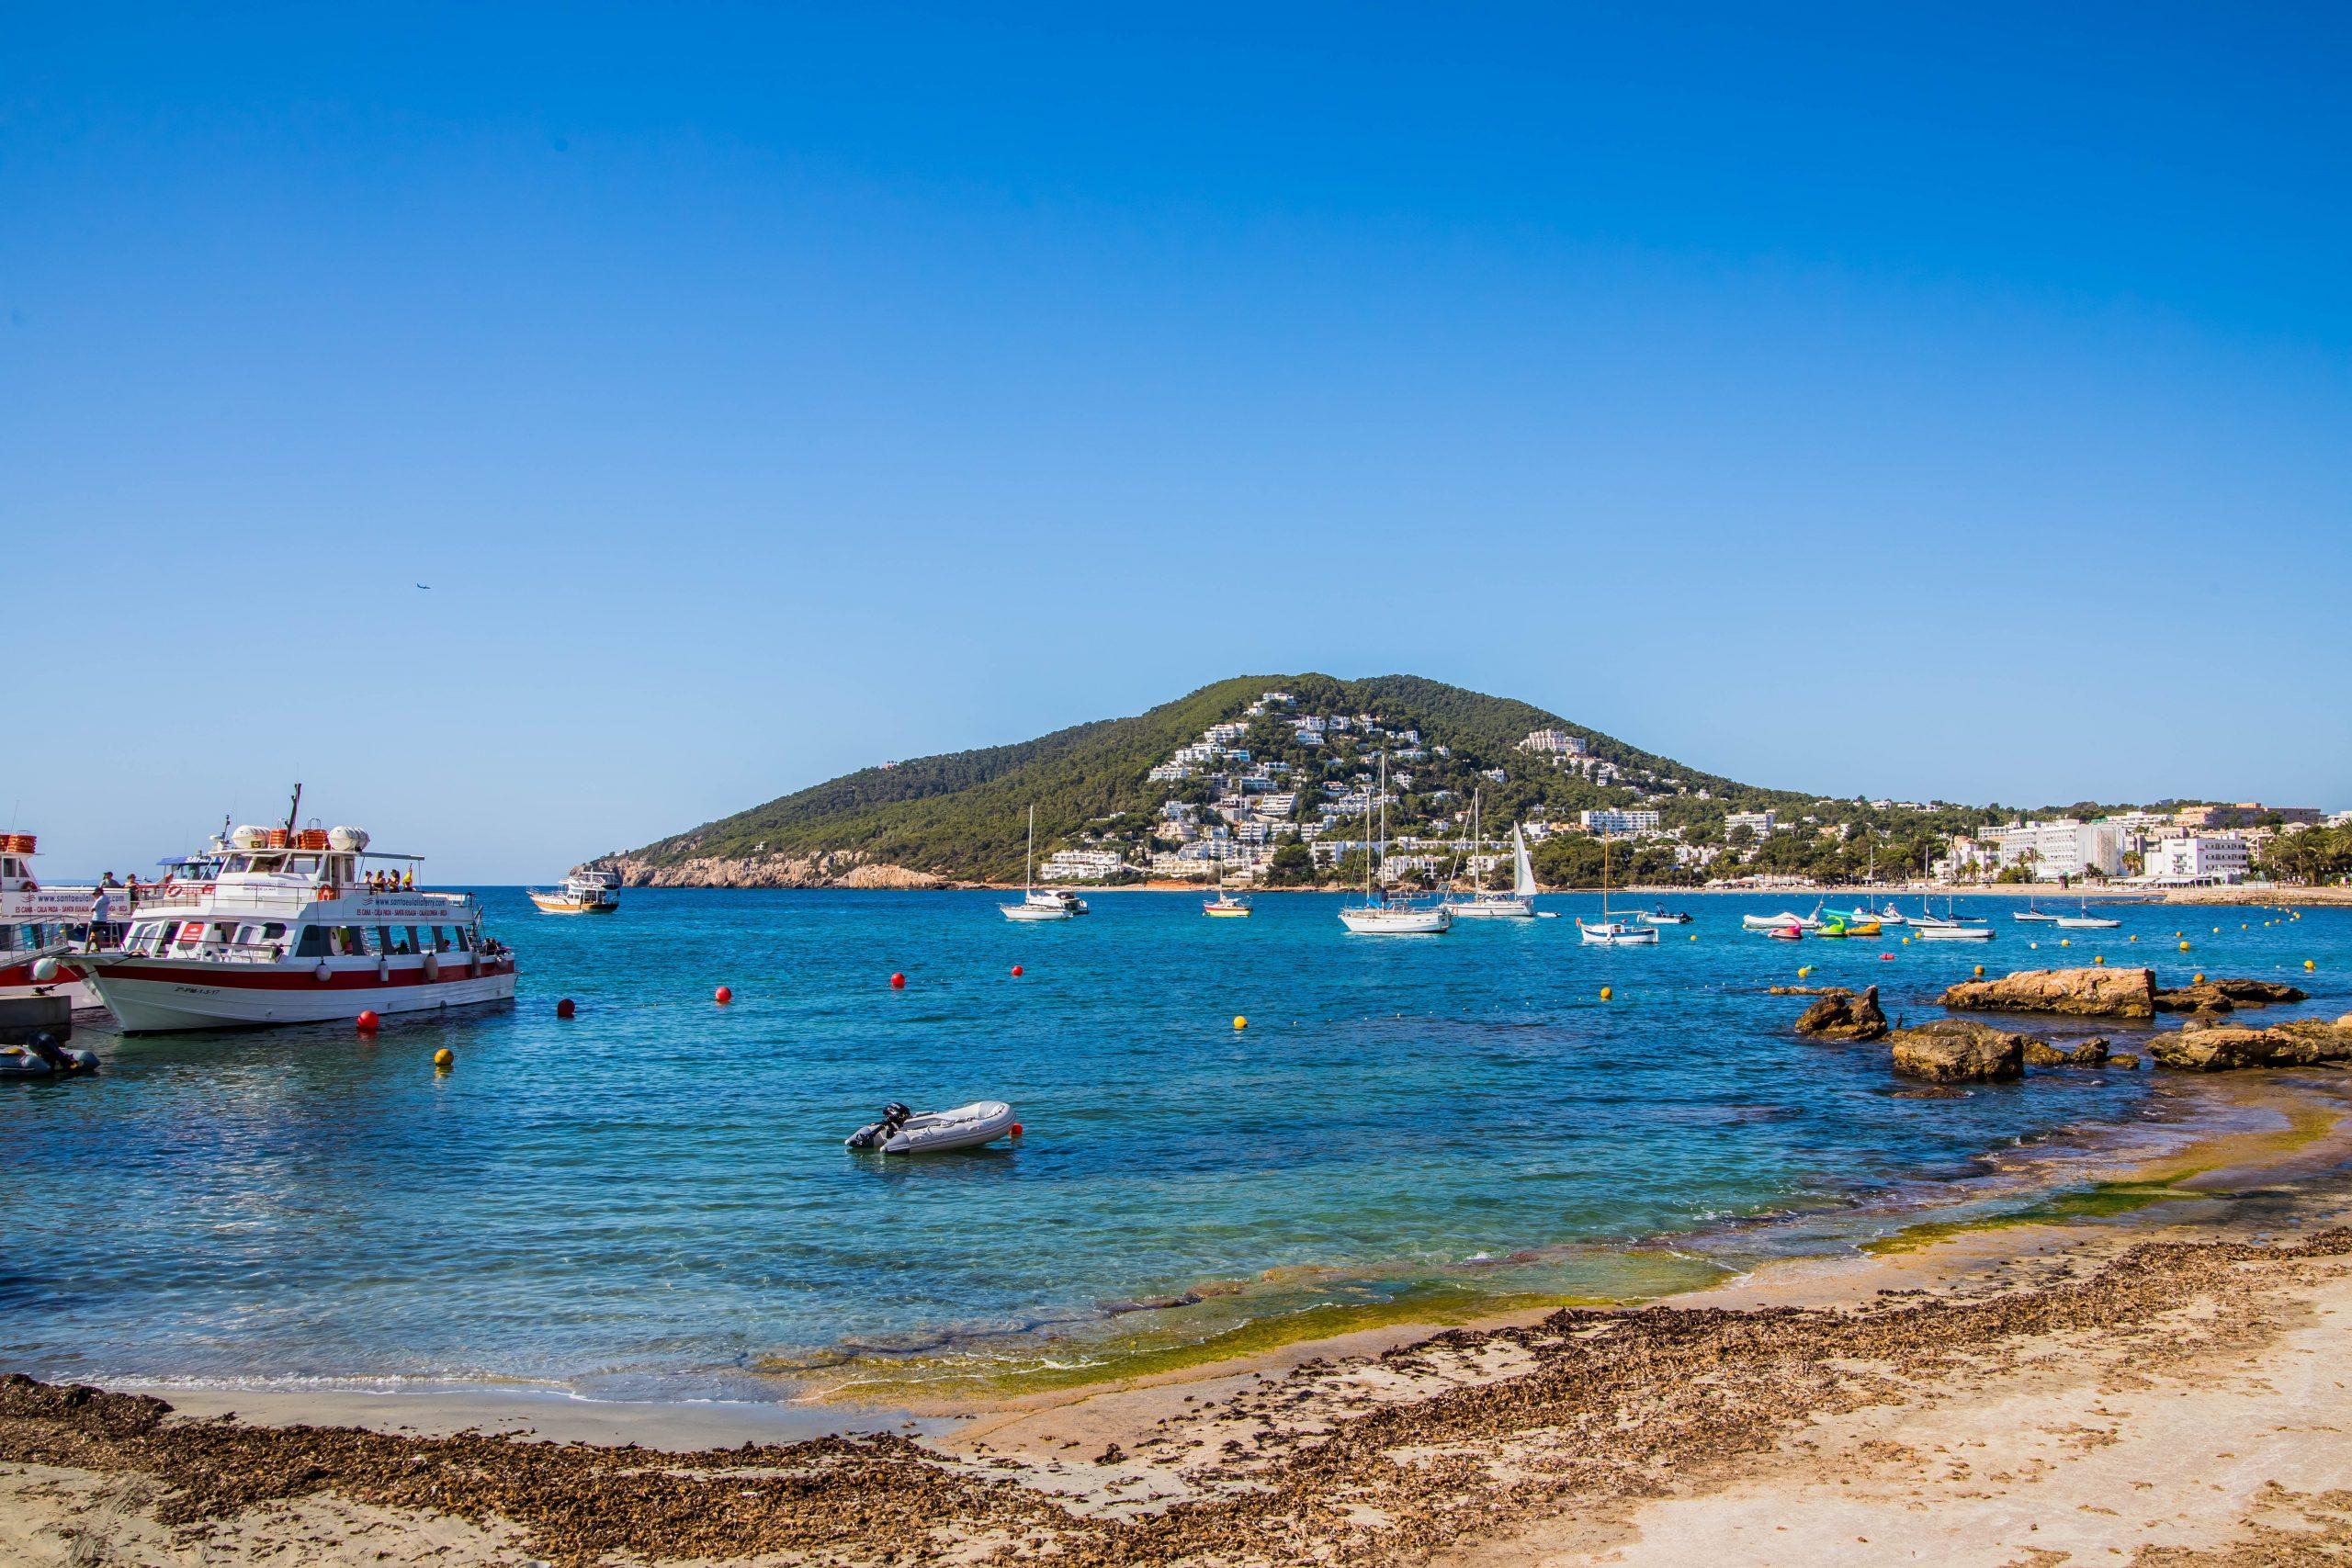 Semana en velero Mallorca Charter Formentera en velero, Crucero Formentera en velero,Rutas en barco por FormenteraTravesía en Menorca en velero